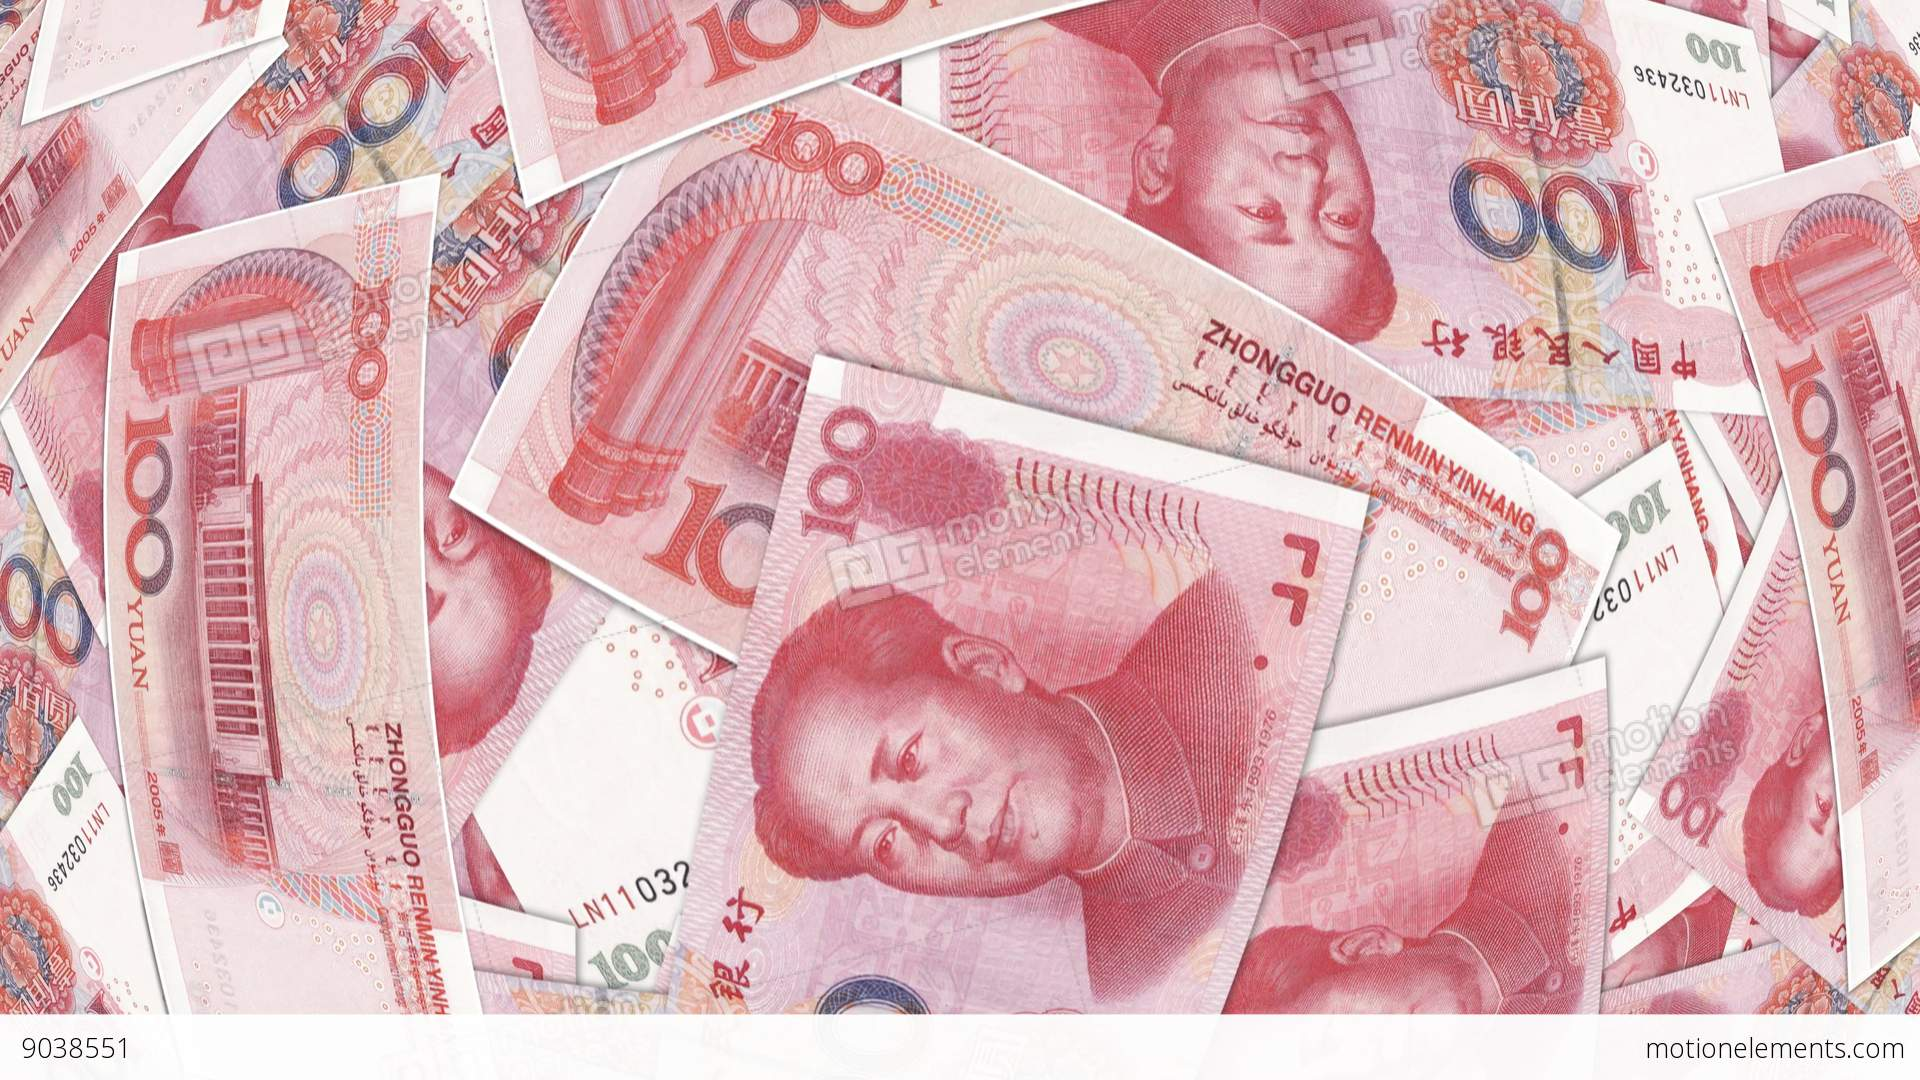 Bank Renminbi Rmb Yuan Chinese Money Banknote Stock Video Footage